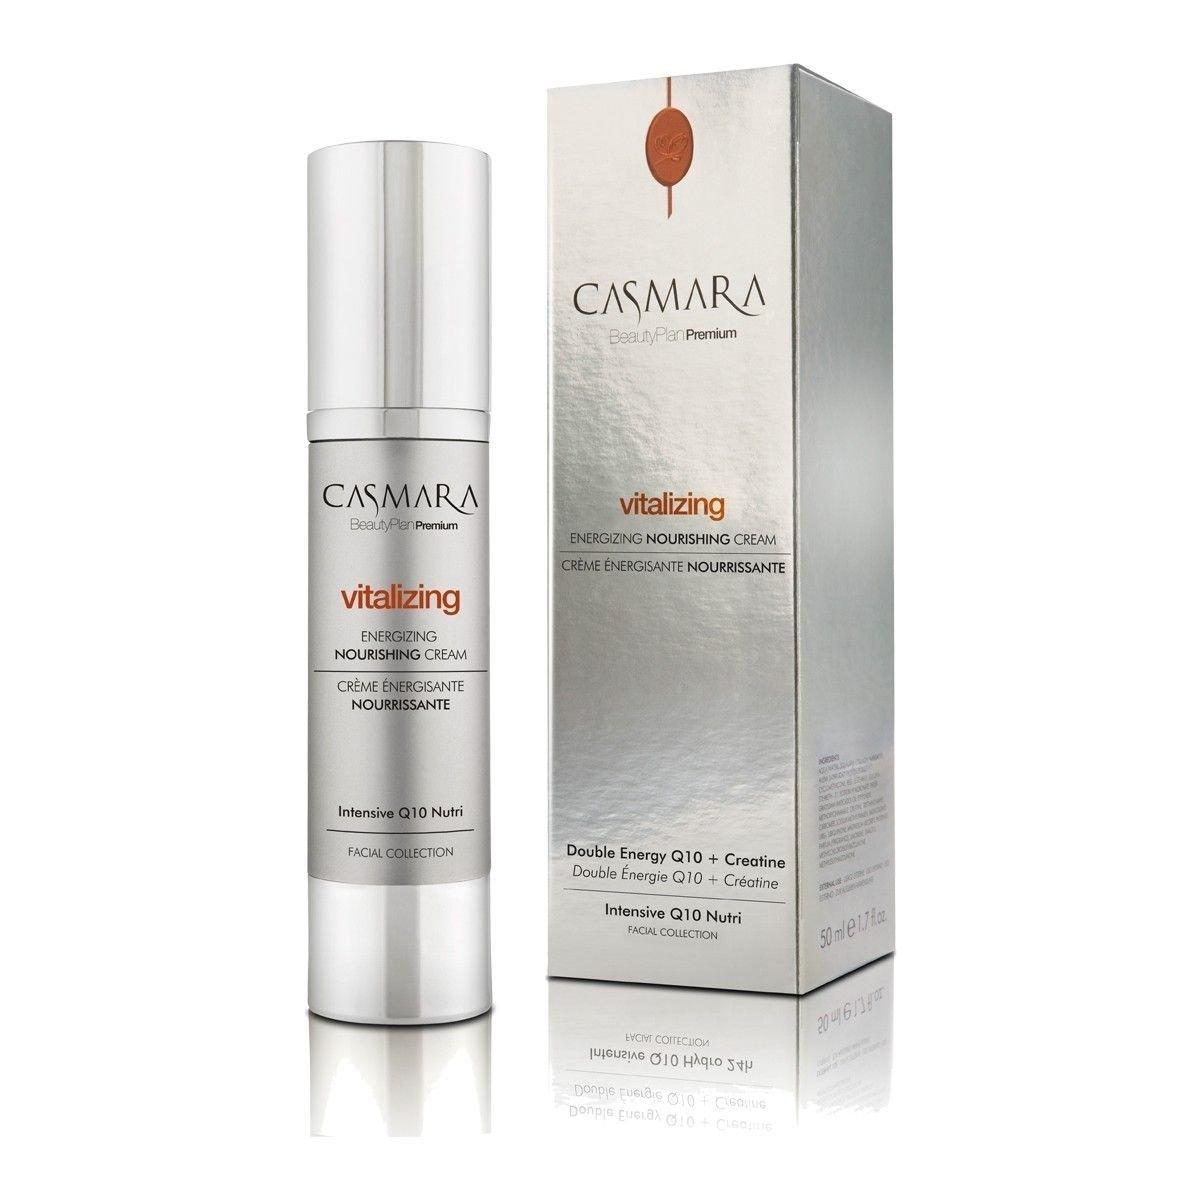 Afbeelding van Casmara Energizing Nourishing Cream 50Ml Vitalizing / Beauty